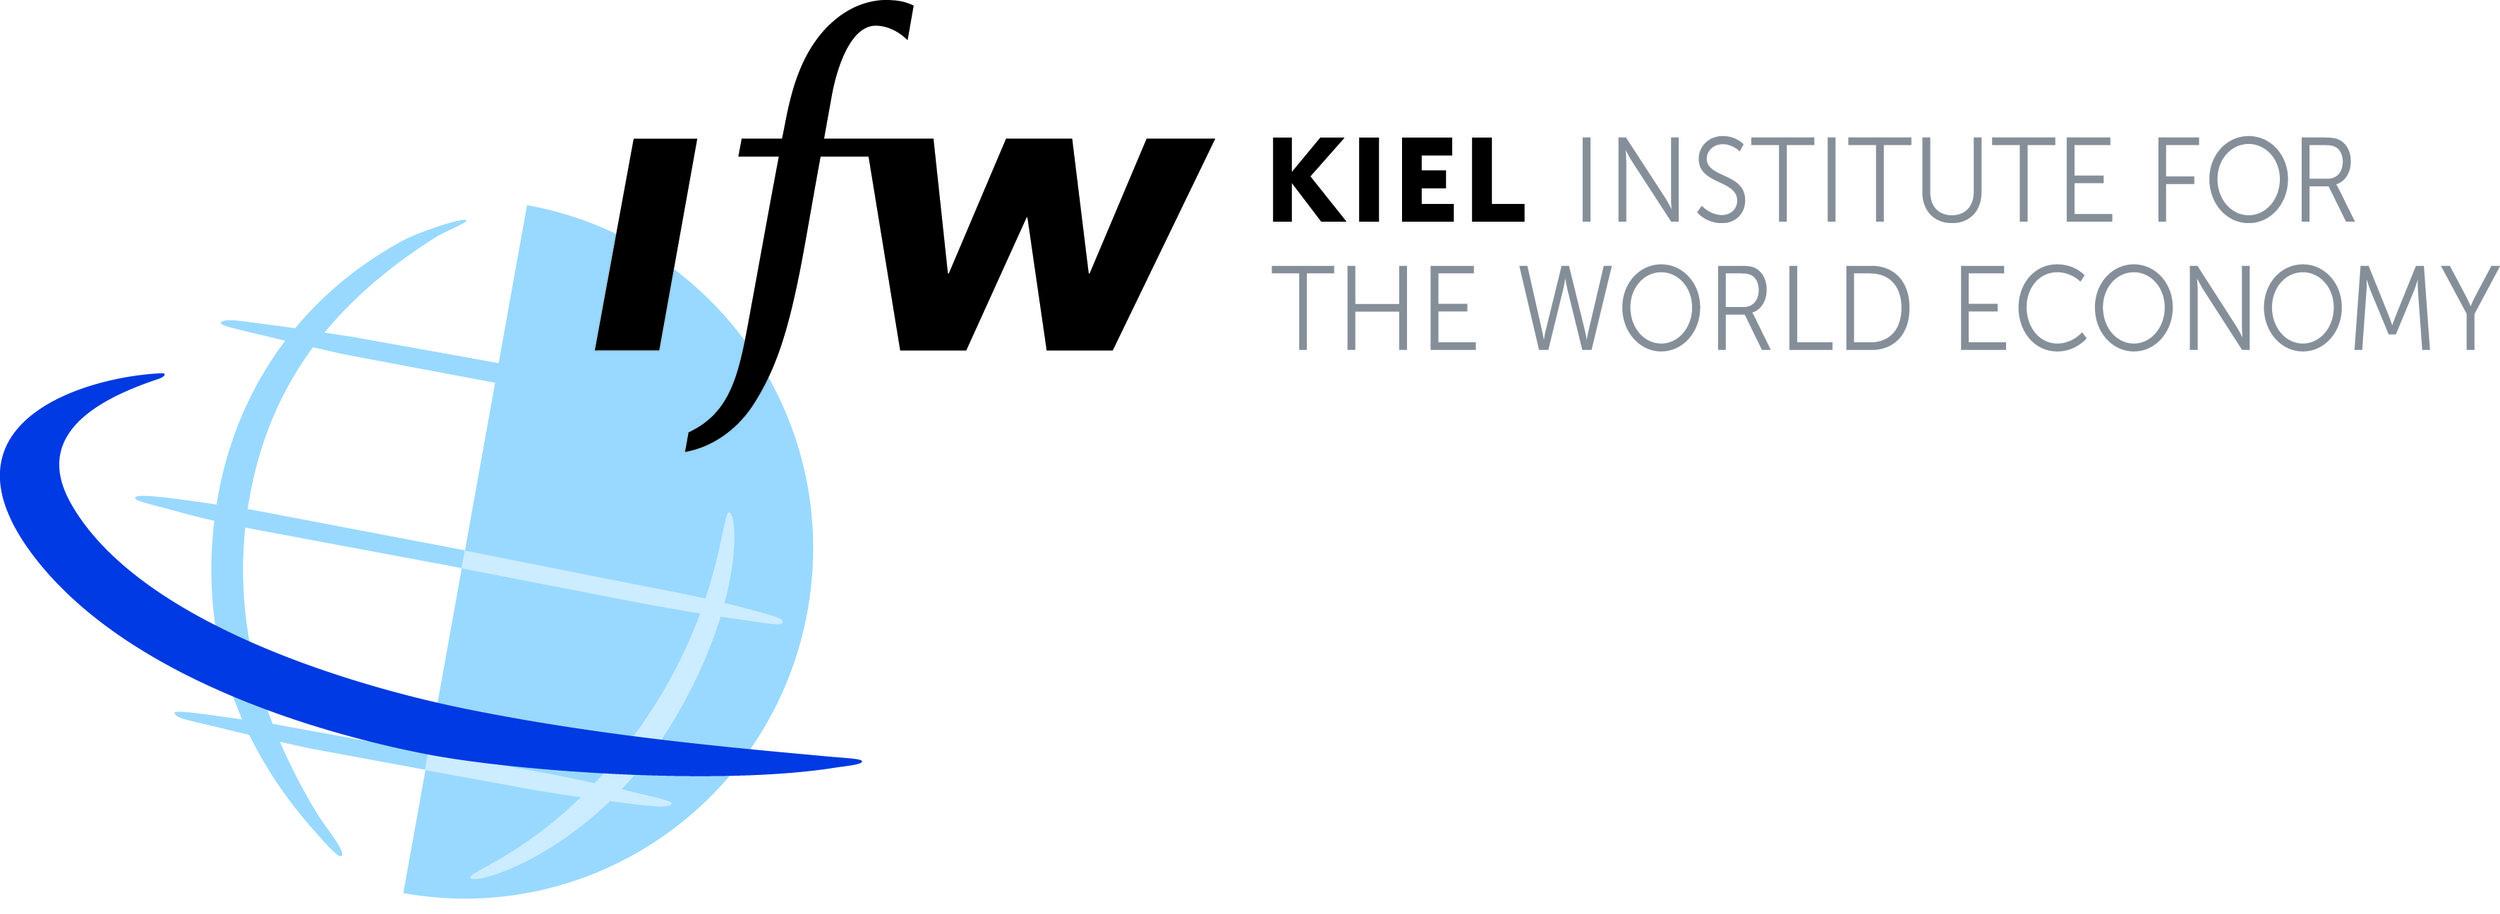 IfW-kiel-institute-world-economy-eu-japan-epa-forum-investment-M-and-A-europe.jpg